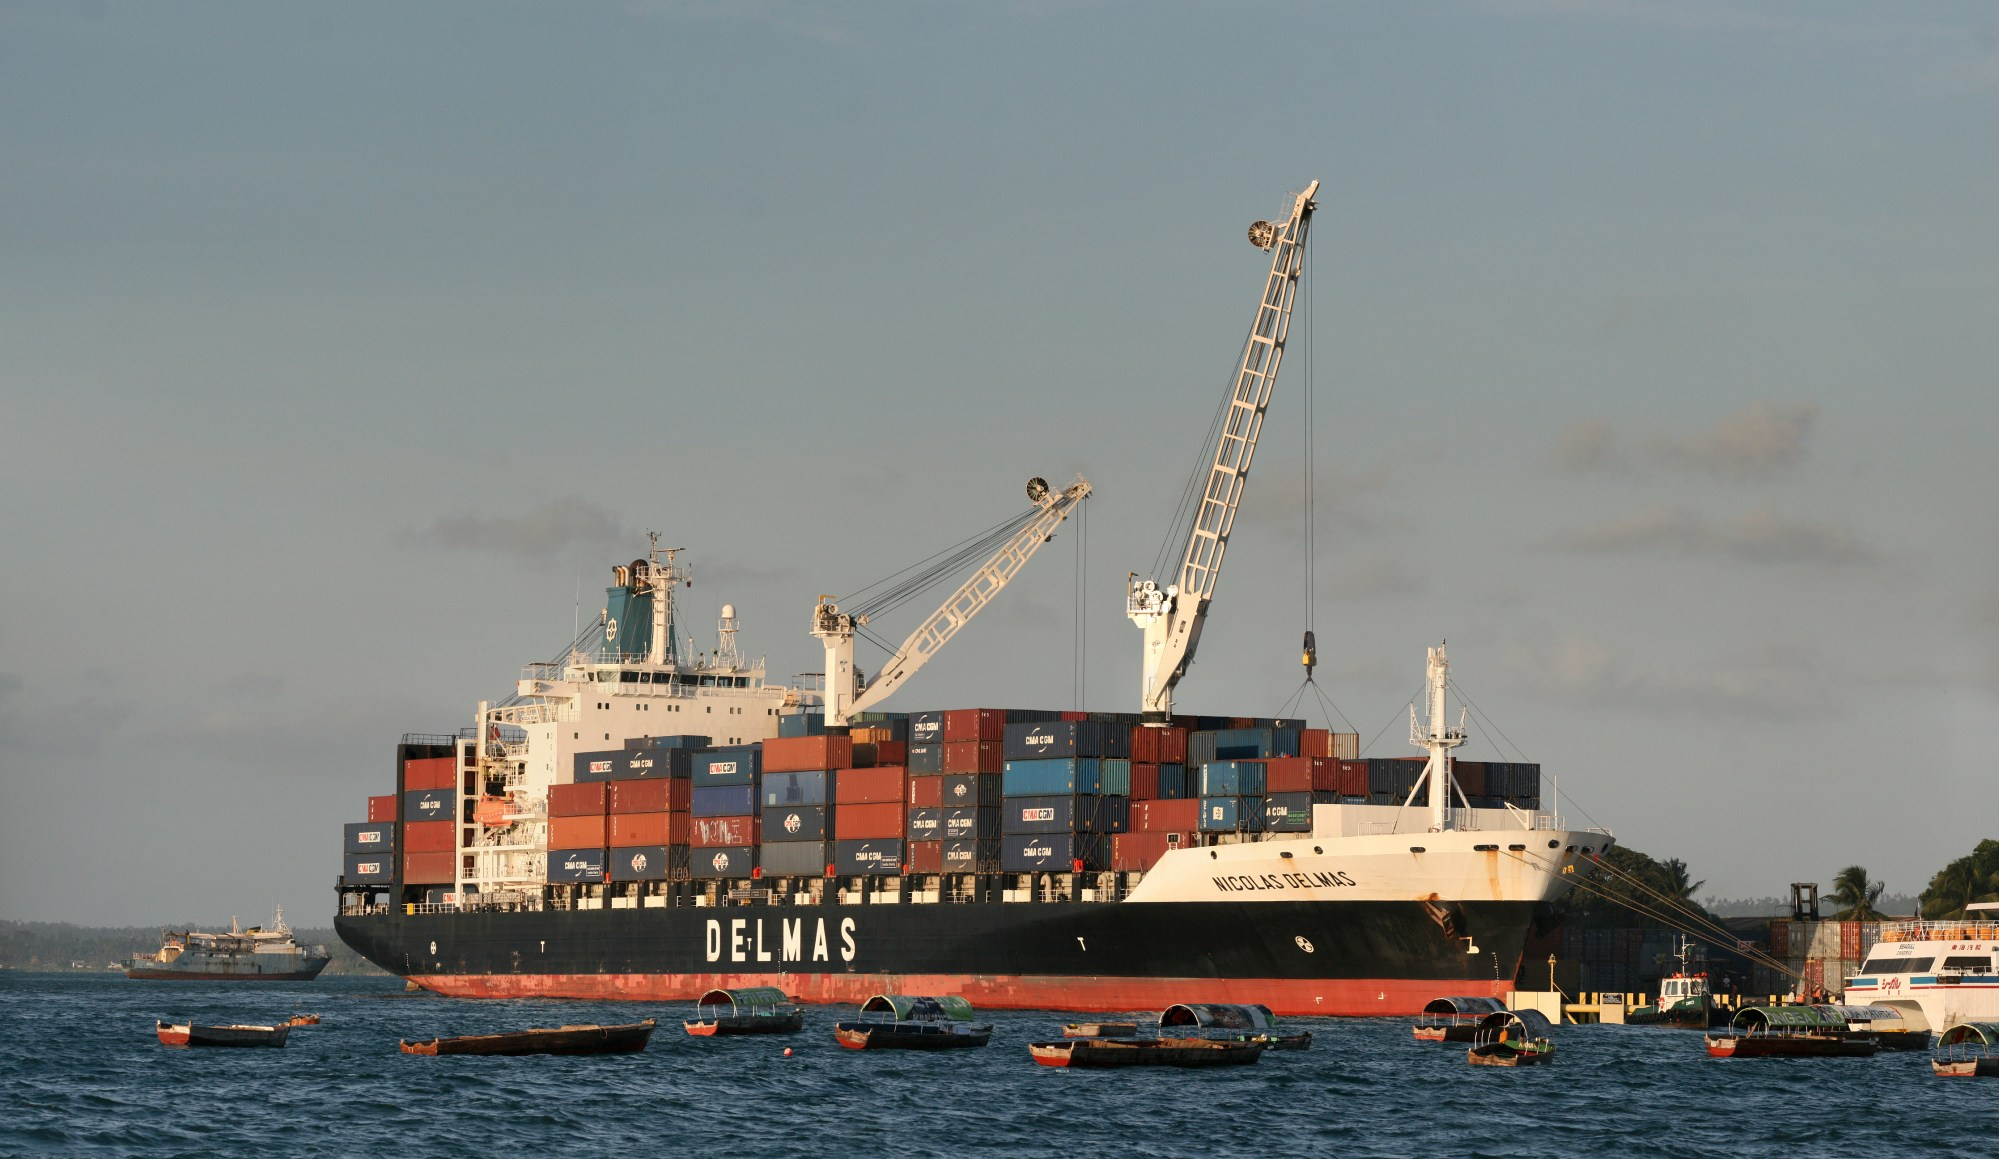 hight resolution of a delmas container ship unloading at the zanzibar port in tanzania